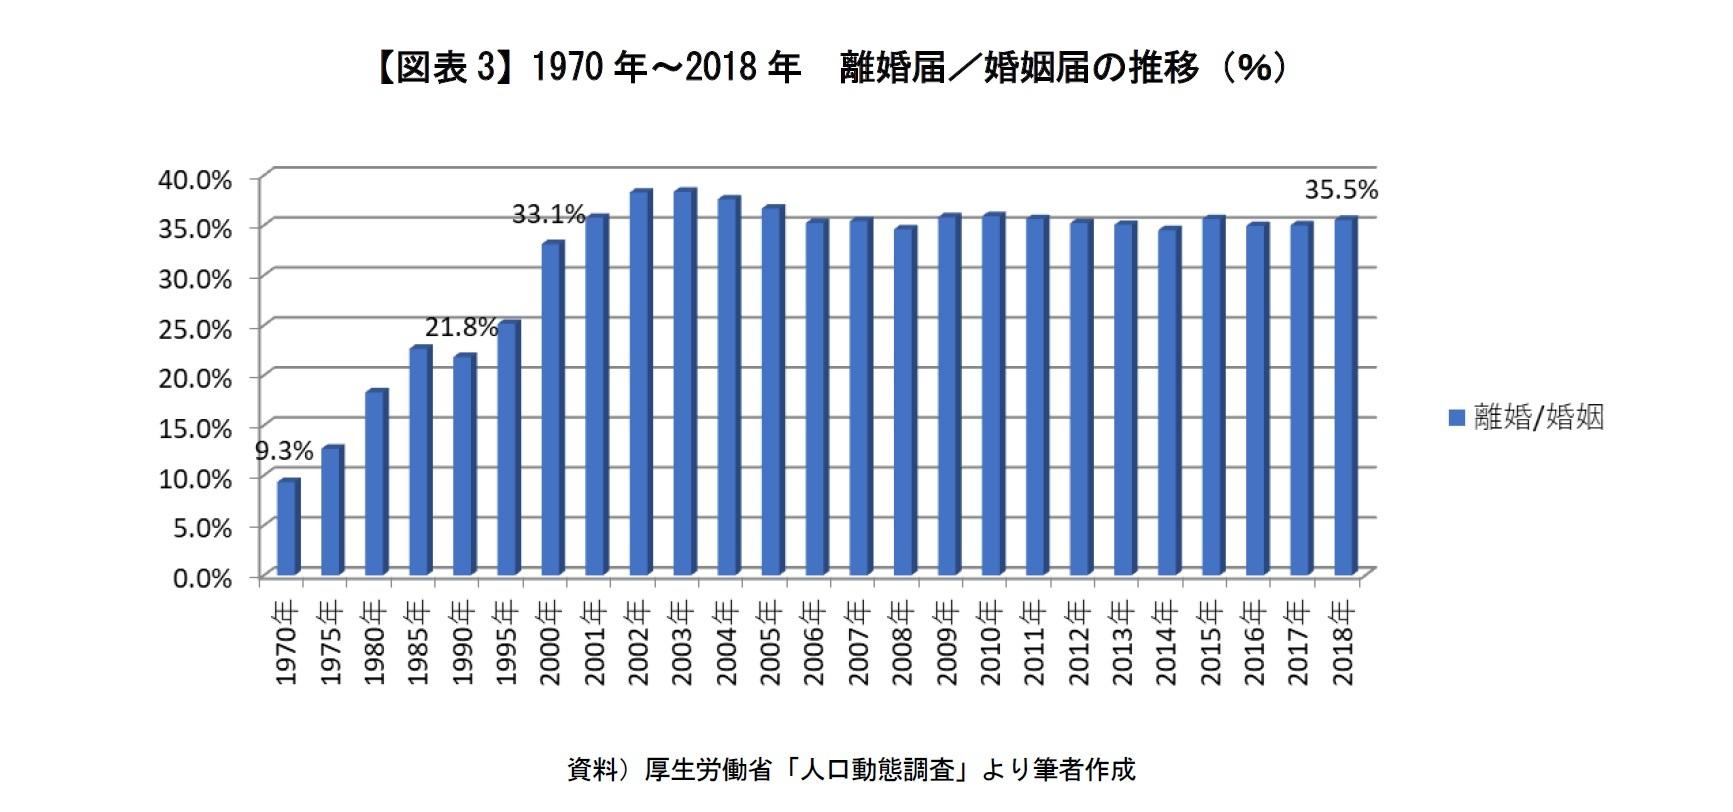 【図表3】1970年~2018年 離婚届/婚姻届の推移(%)